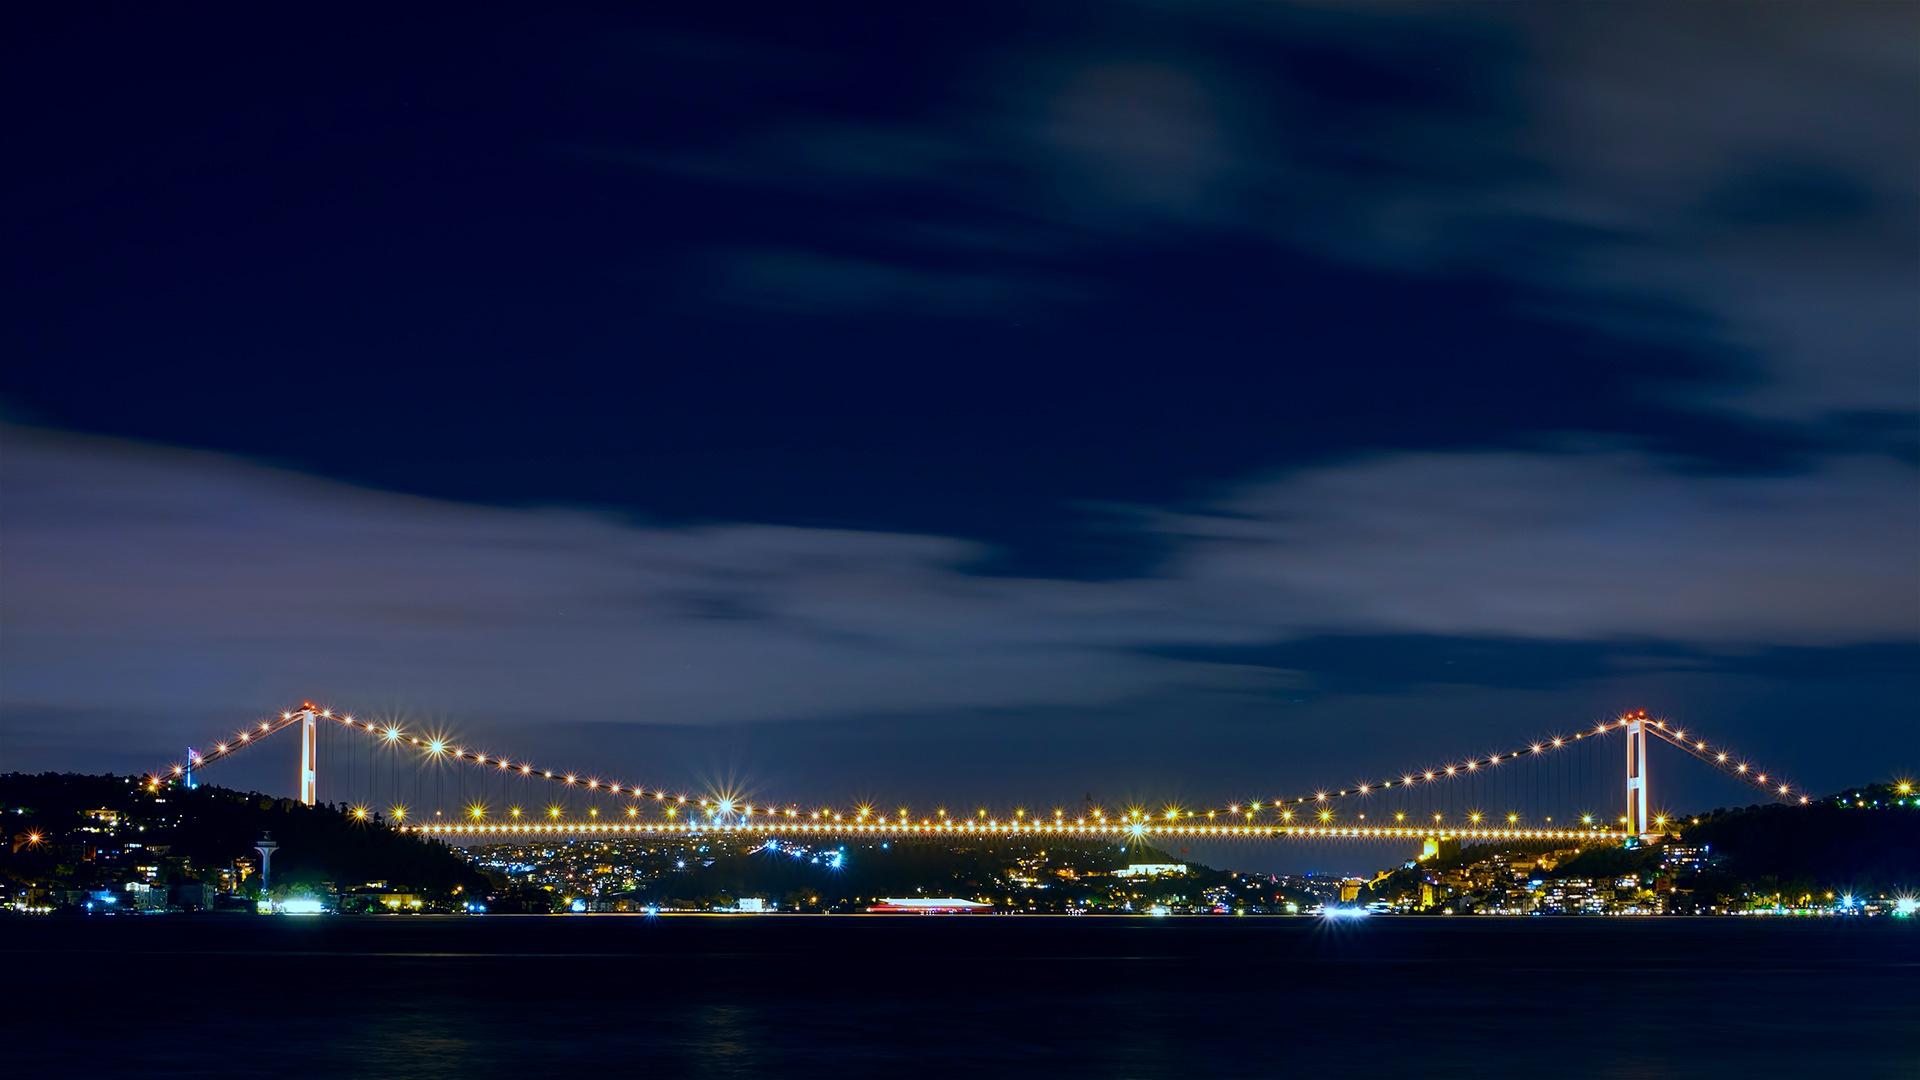 FSM Bridge in Istanbul by Ciddi Biri